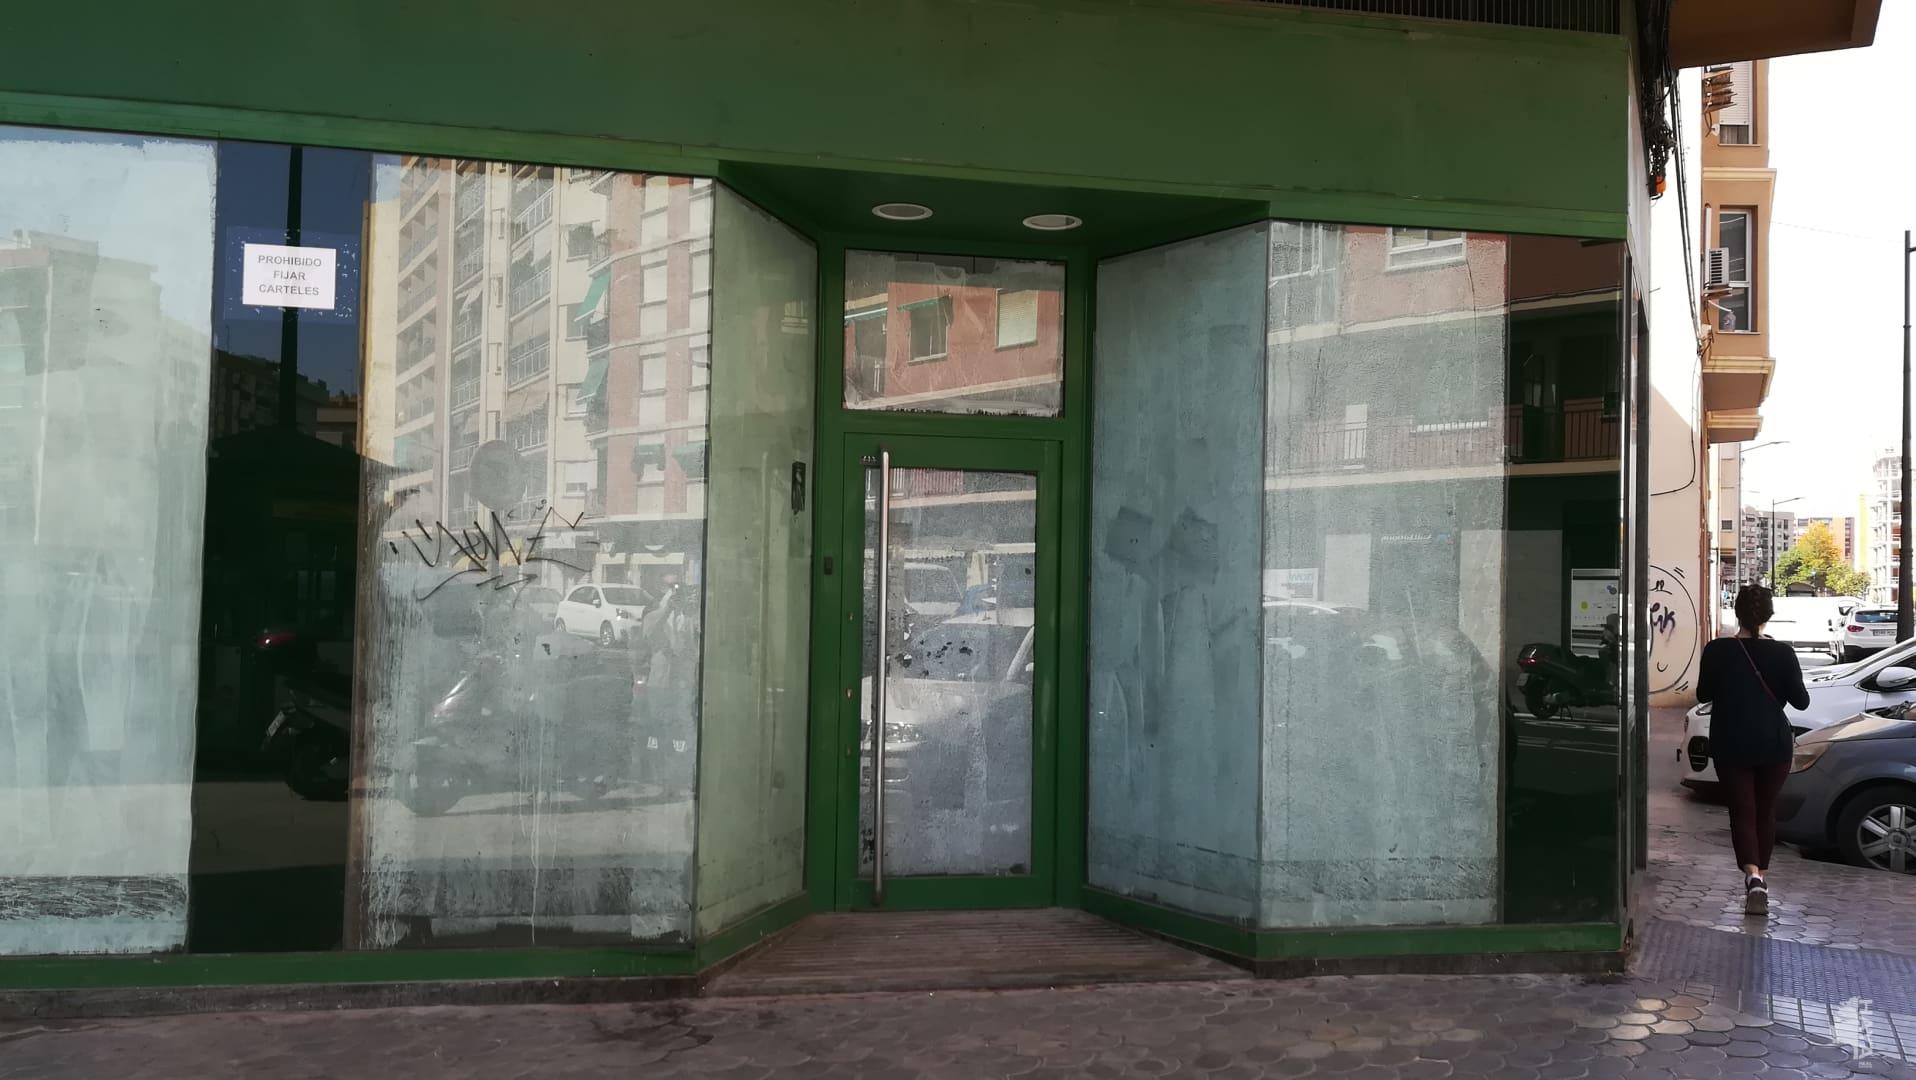 Local en venta en Valencia, Valencia, Calle Juan de Aguilo, 570.279 €, 159 m2